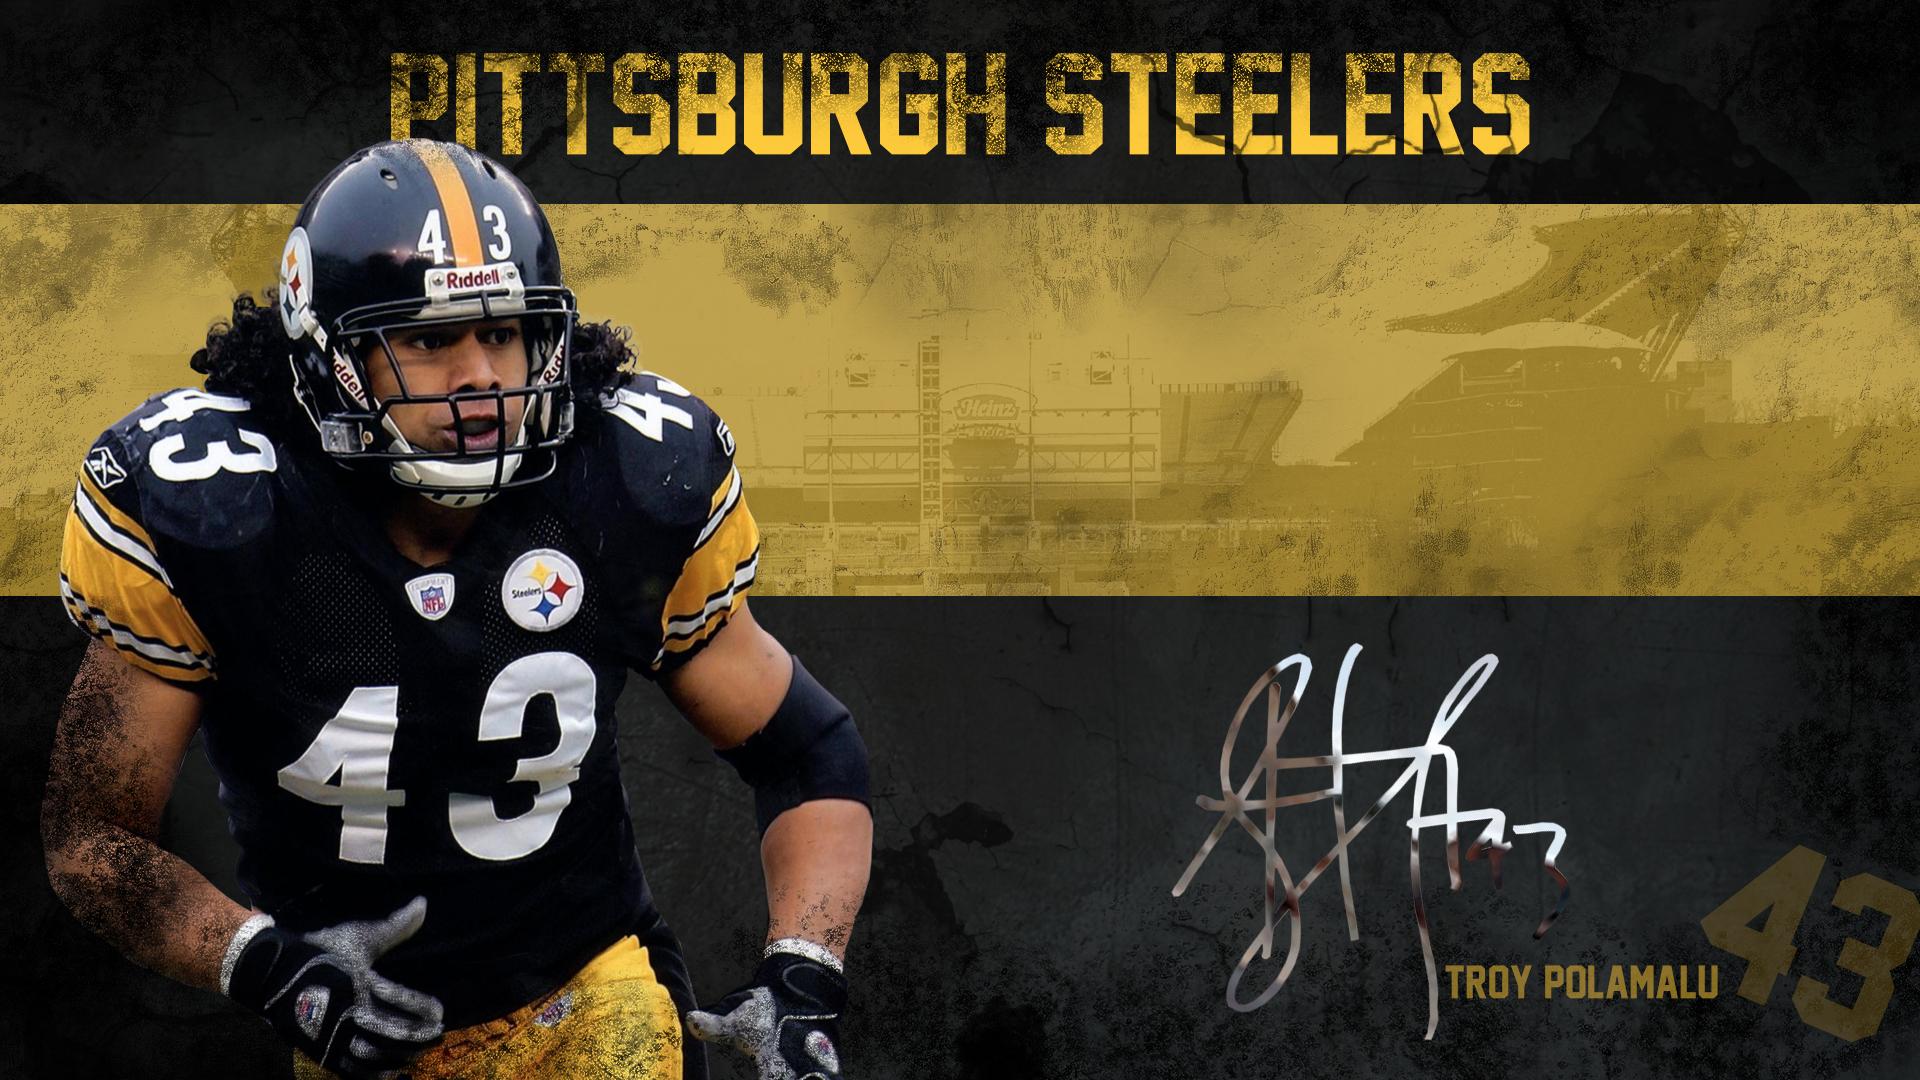 Troy Polamalu Wallpaper   Pittsburgh Steelers Wallpaper 34080251 1920x1080